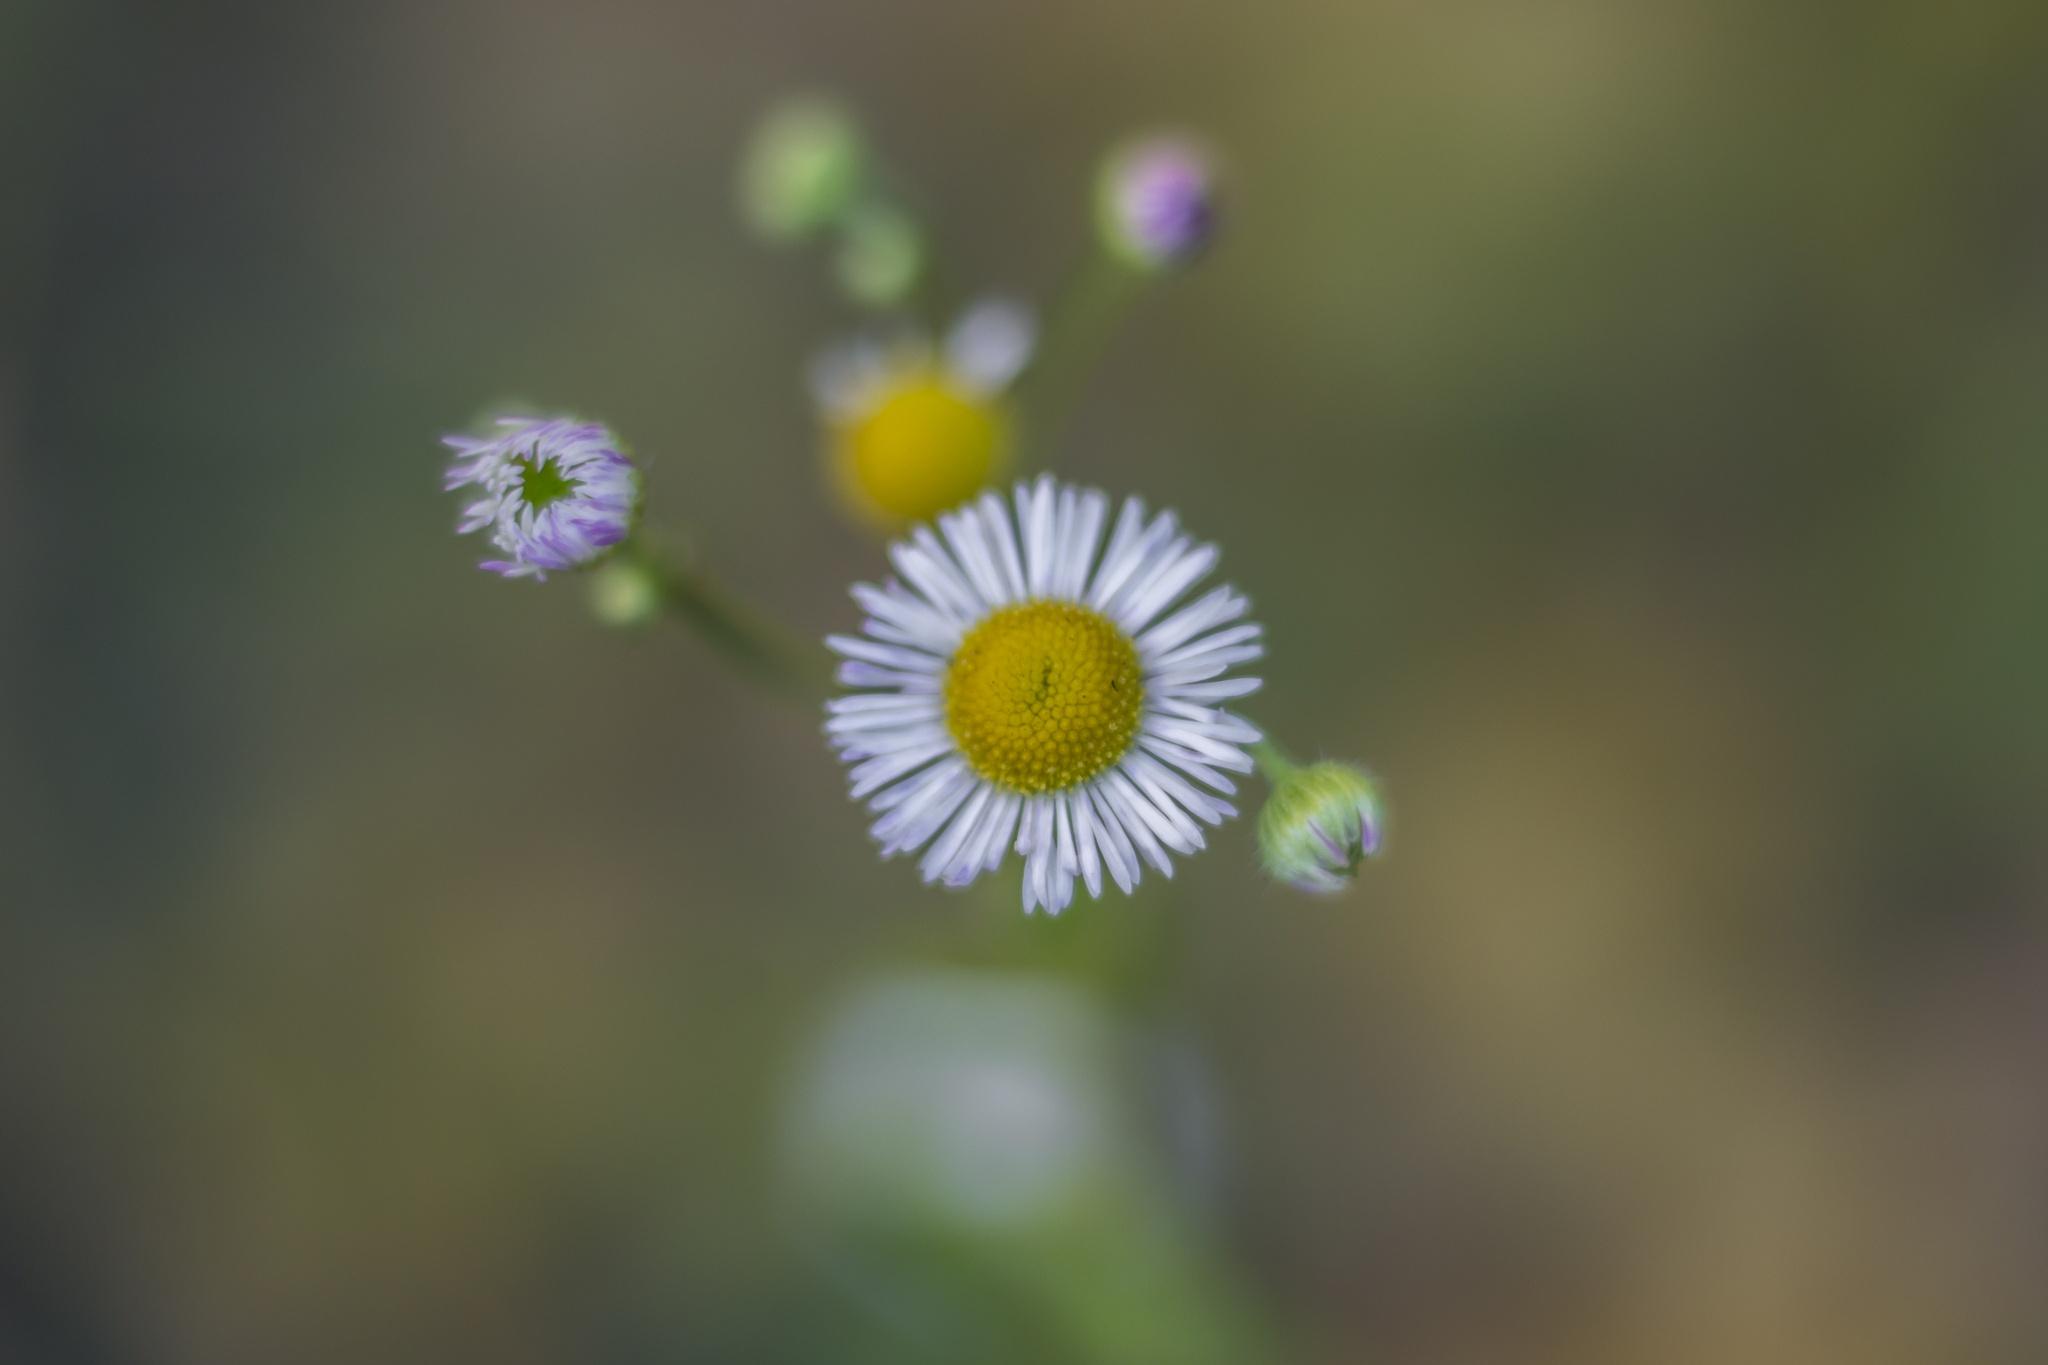 flower by Roman Borshovskyy